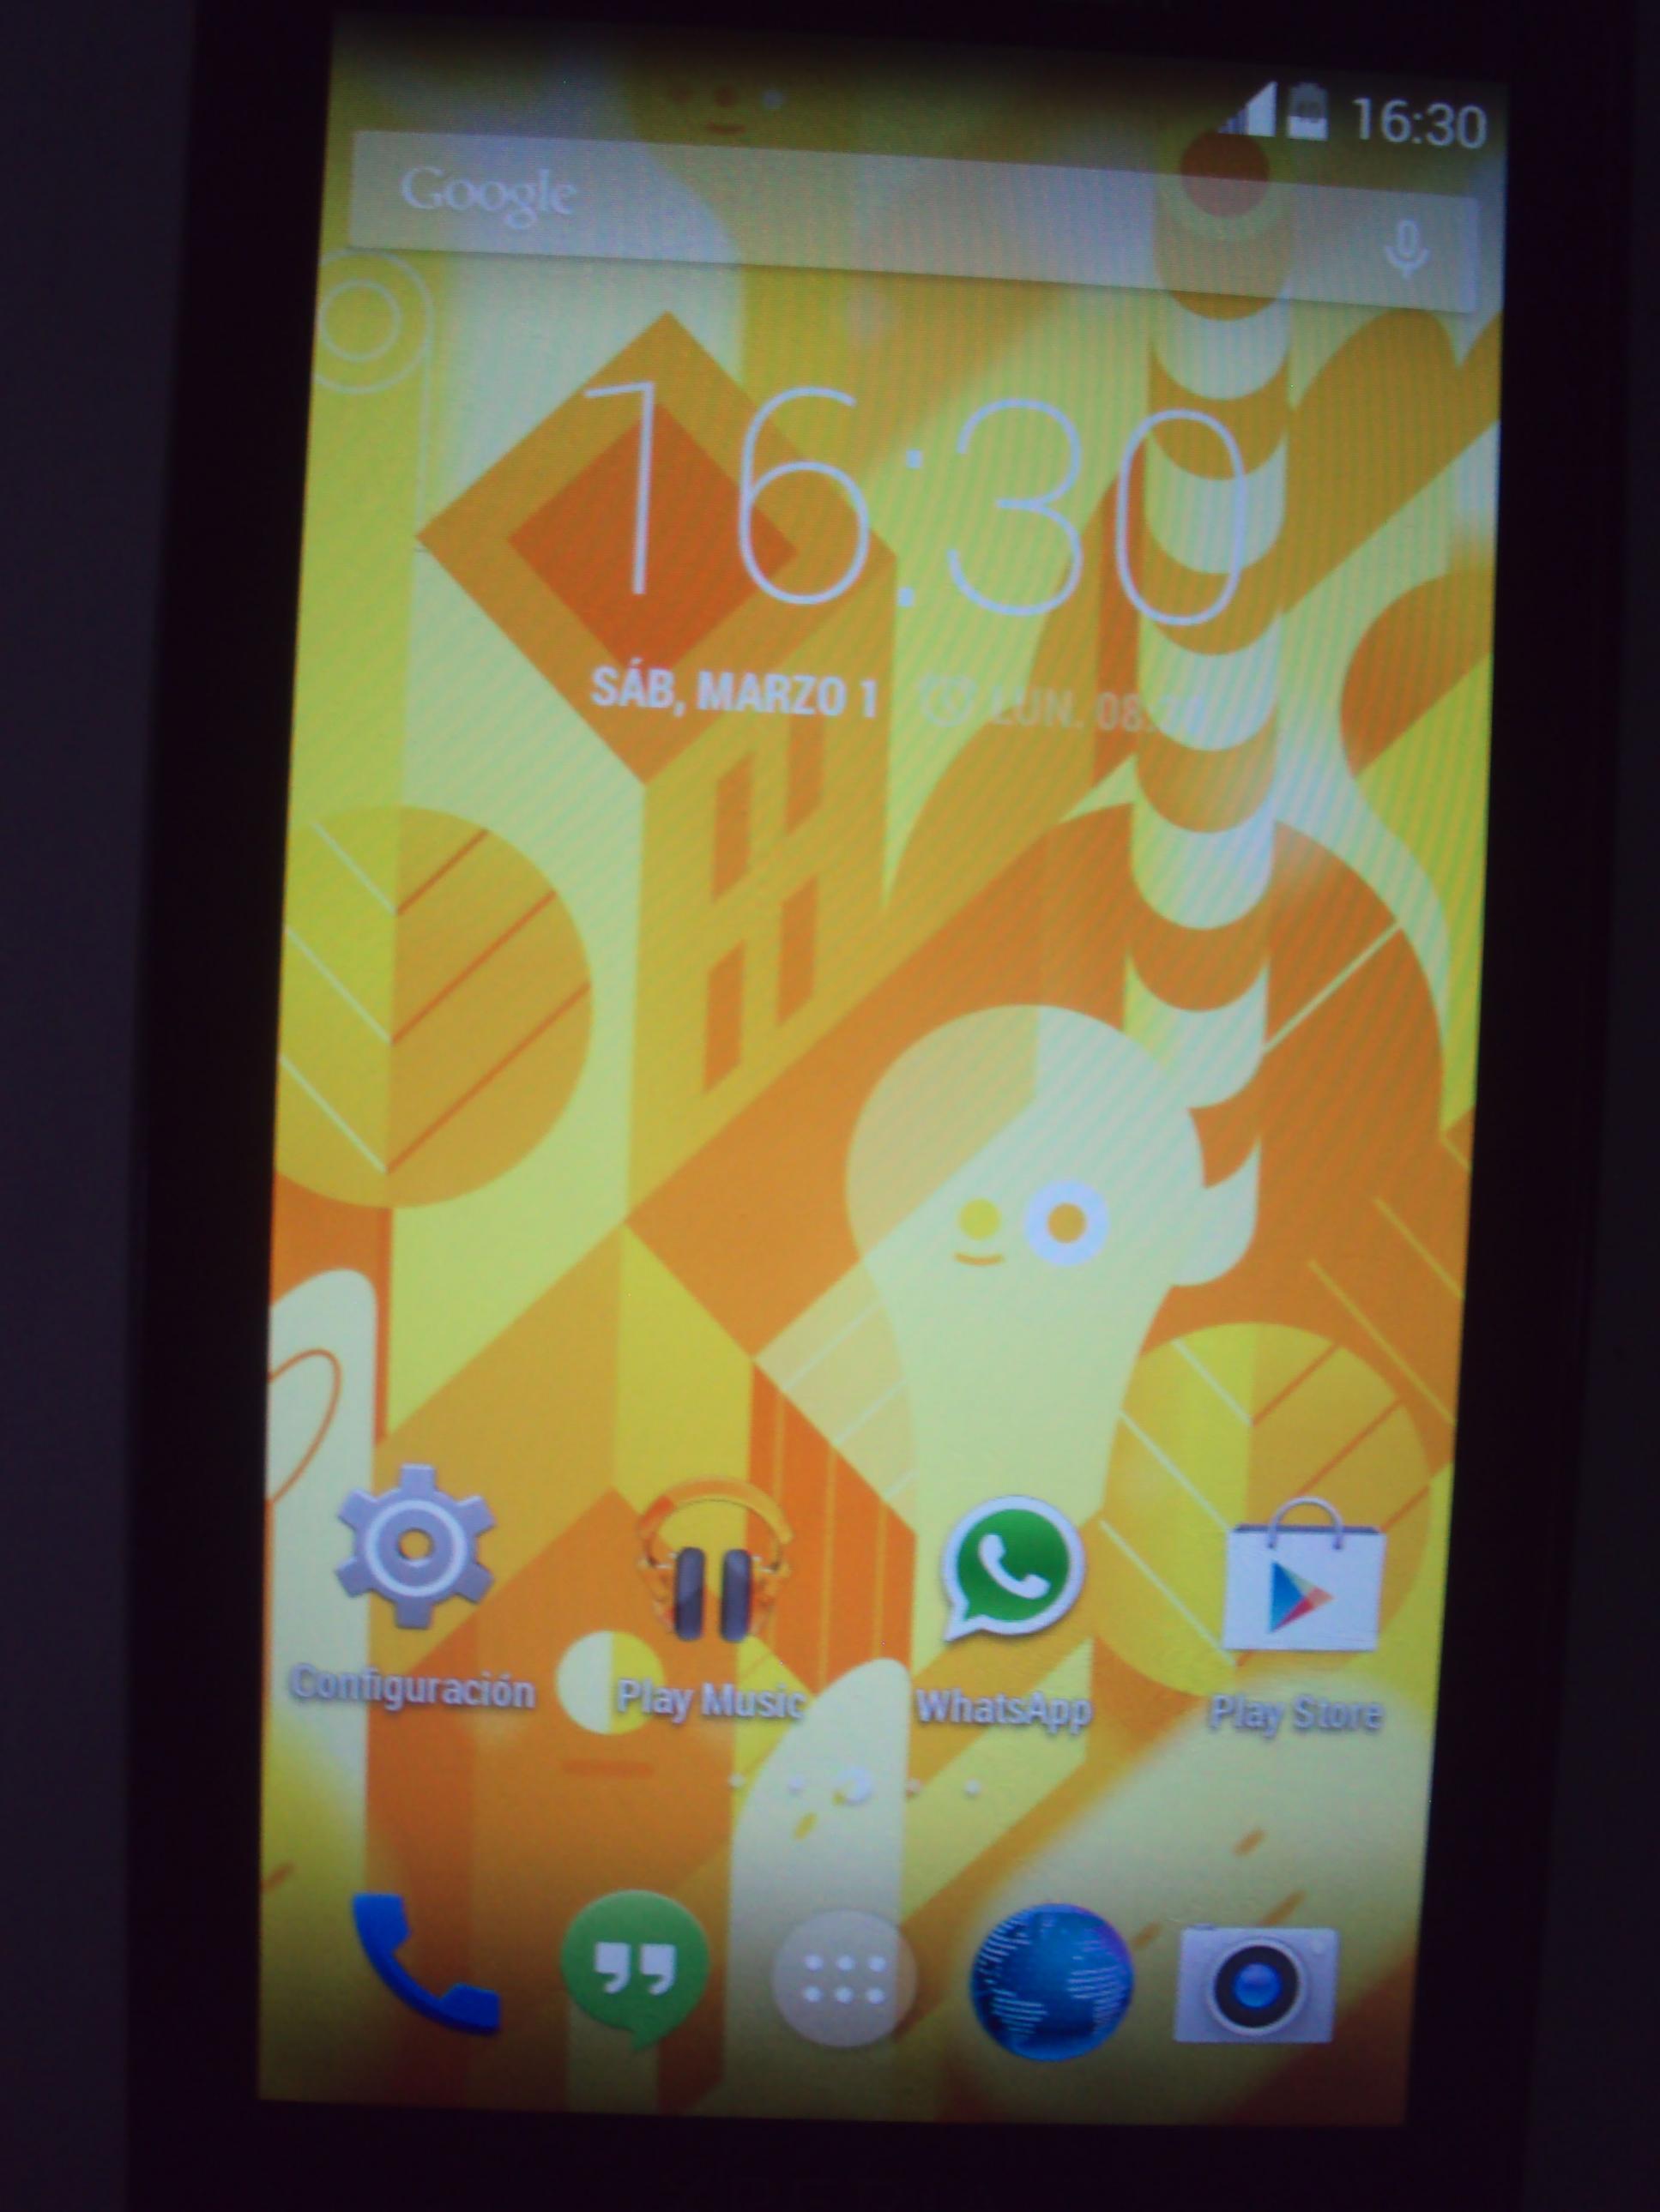 Xperia X10 KitKat Homescreen